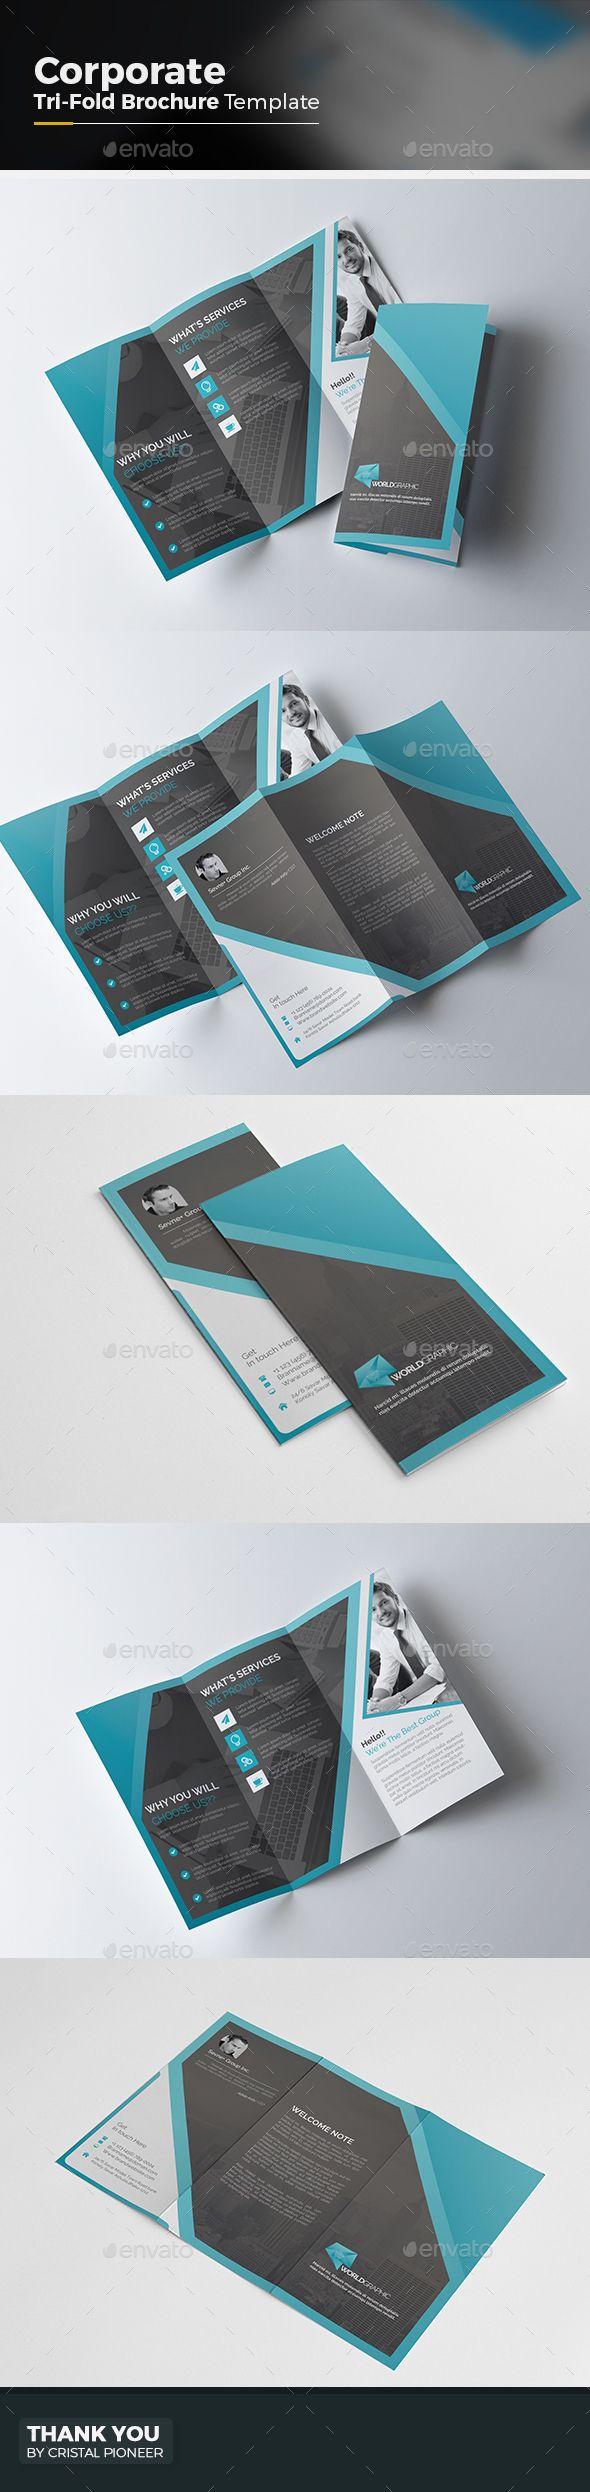 Tri fold Brochure Template Vector EPS, AI. Download here: http://graphicriver.net/item/tri-fold-brochure/15158671?ref=ksioks